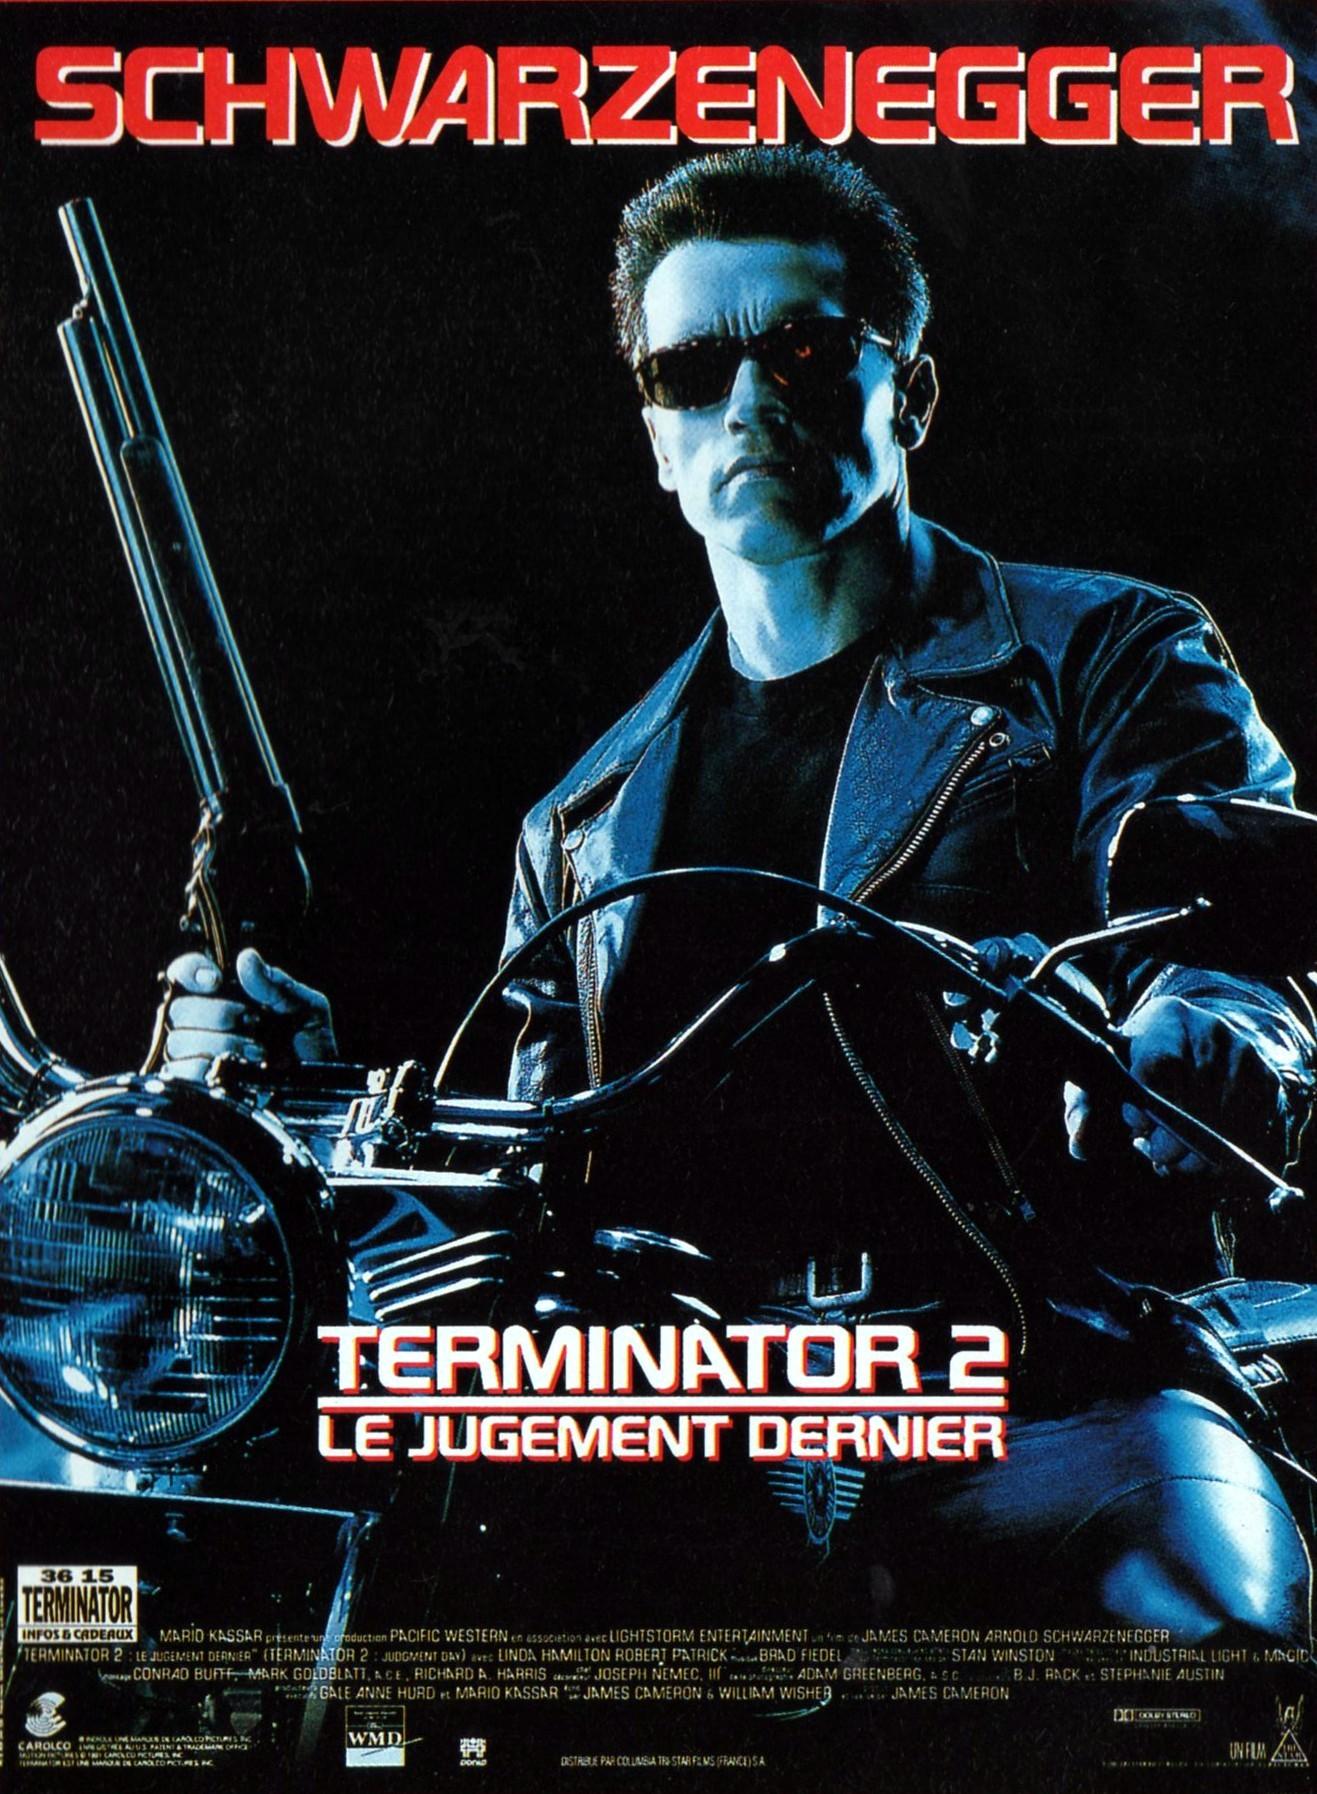 terminator-2-judgment-day-538408l.jpg